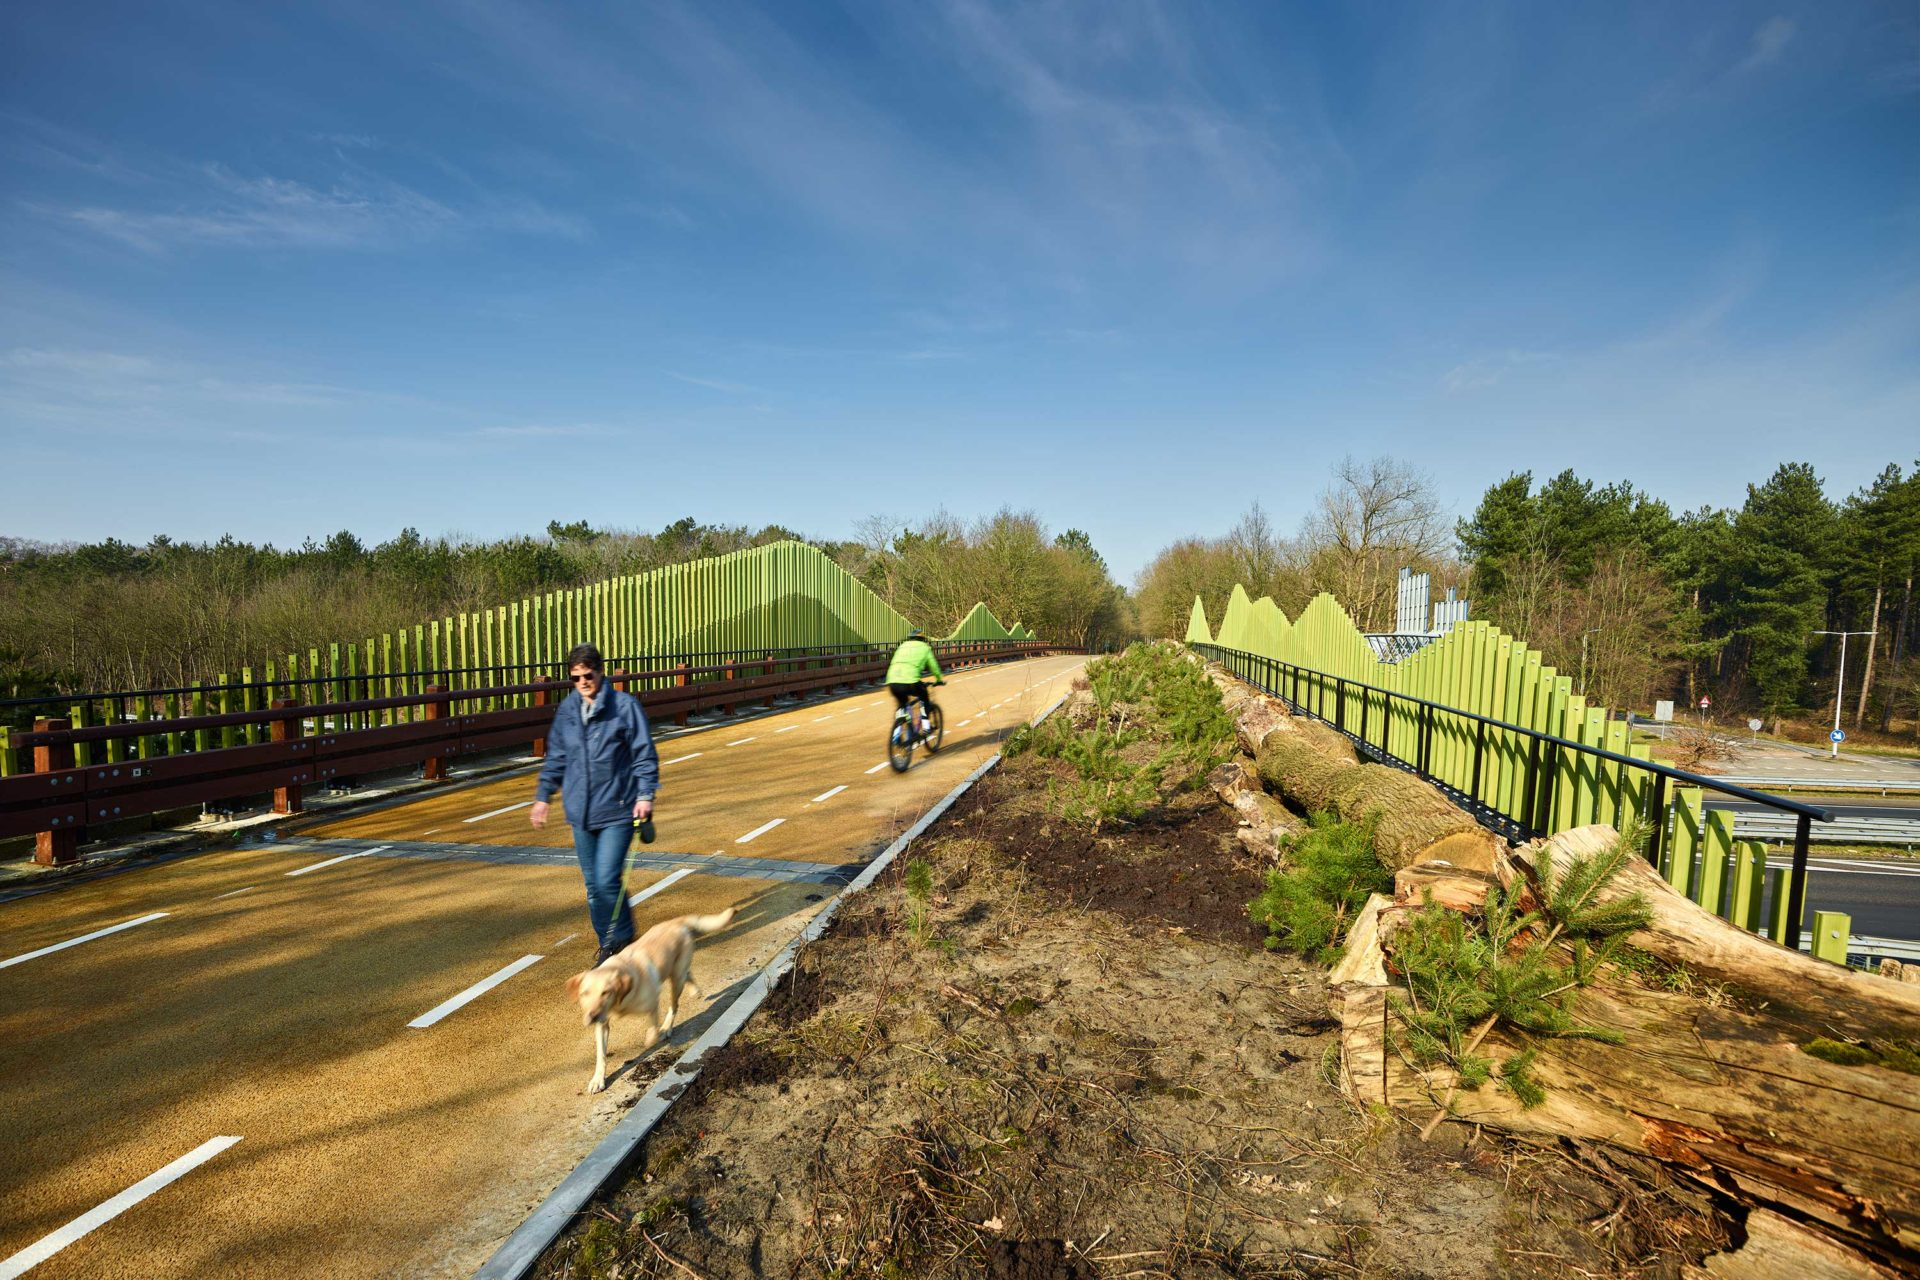 Zoomland viaduct: bio-based showcase across the motorway